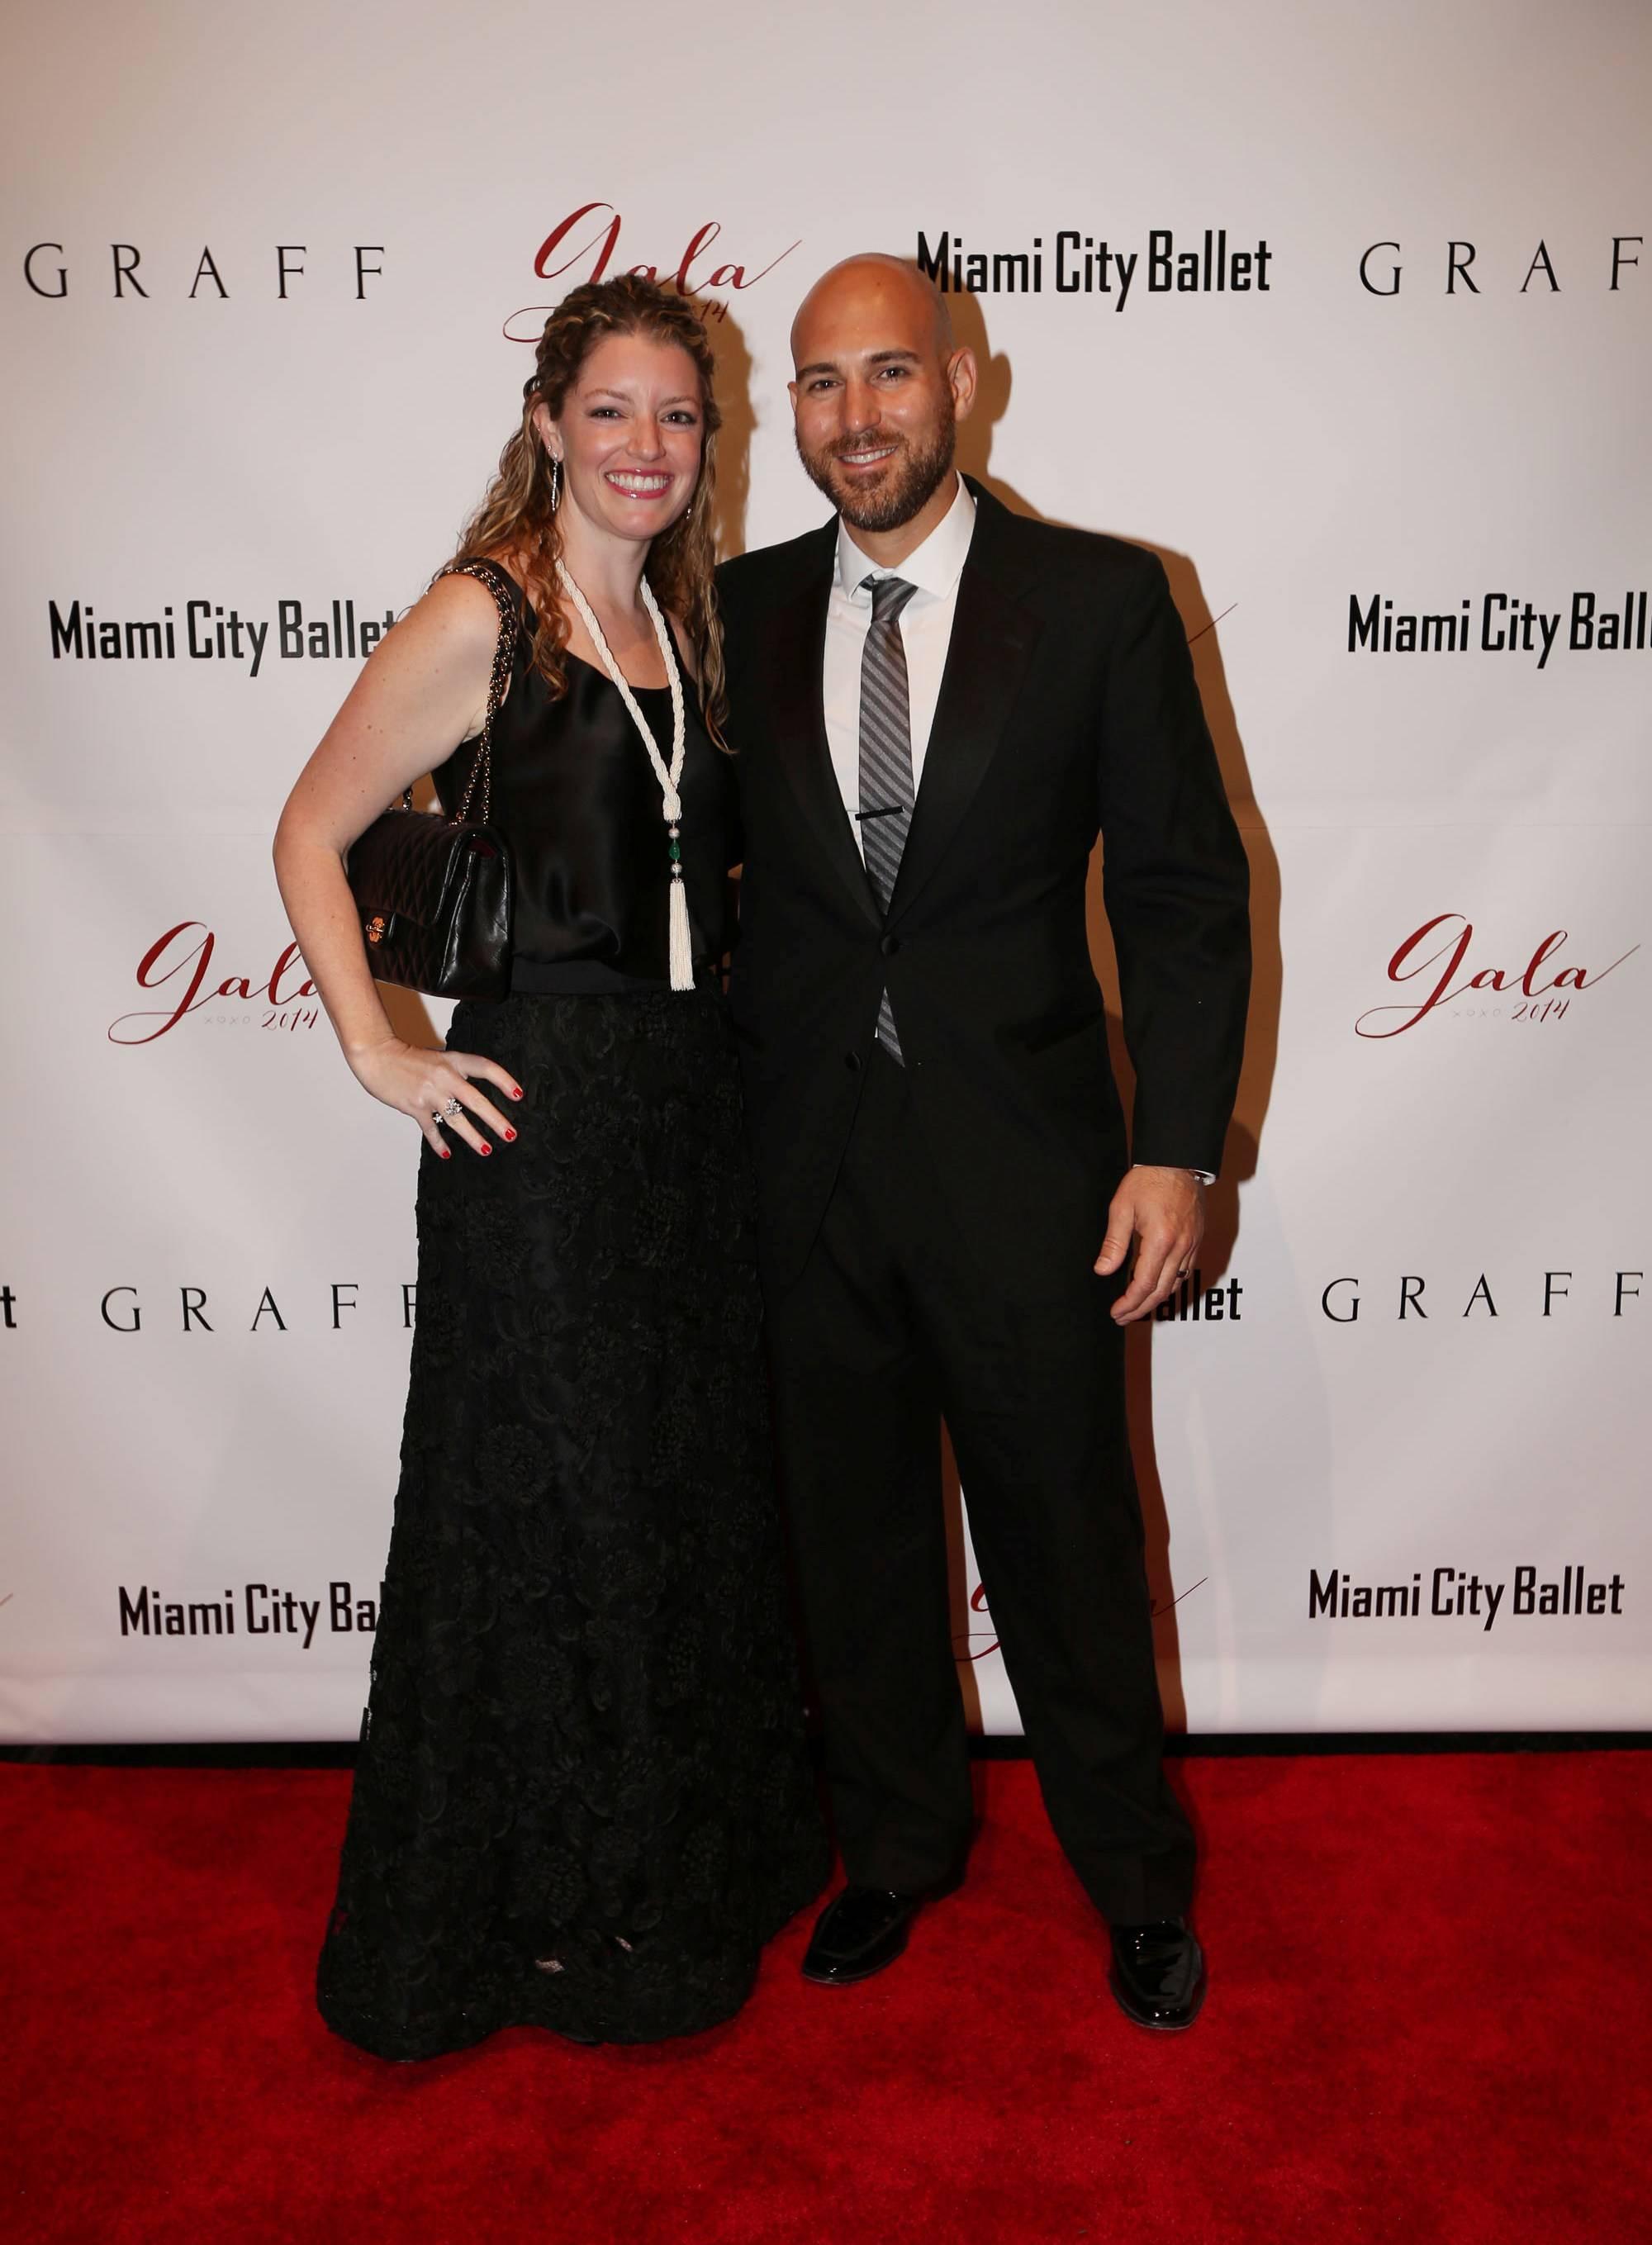 A1 Miami City Ballet Trustee Randi Wolfson Adamo & Chris Adamo_WRE